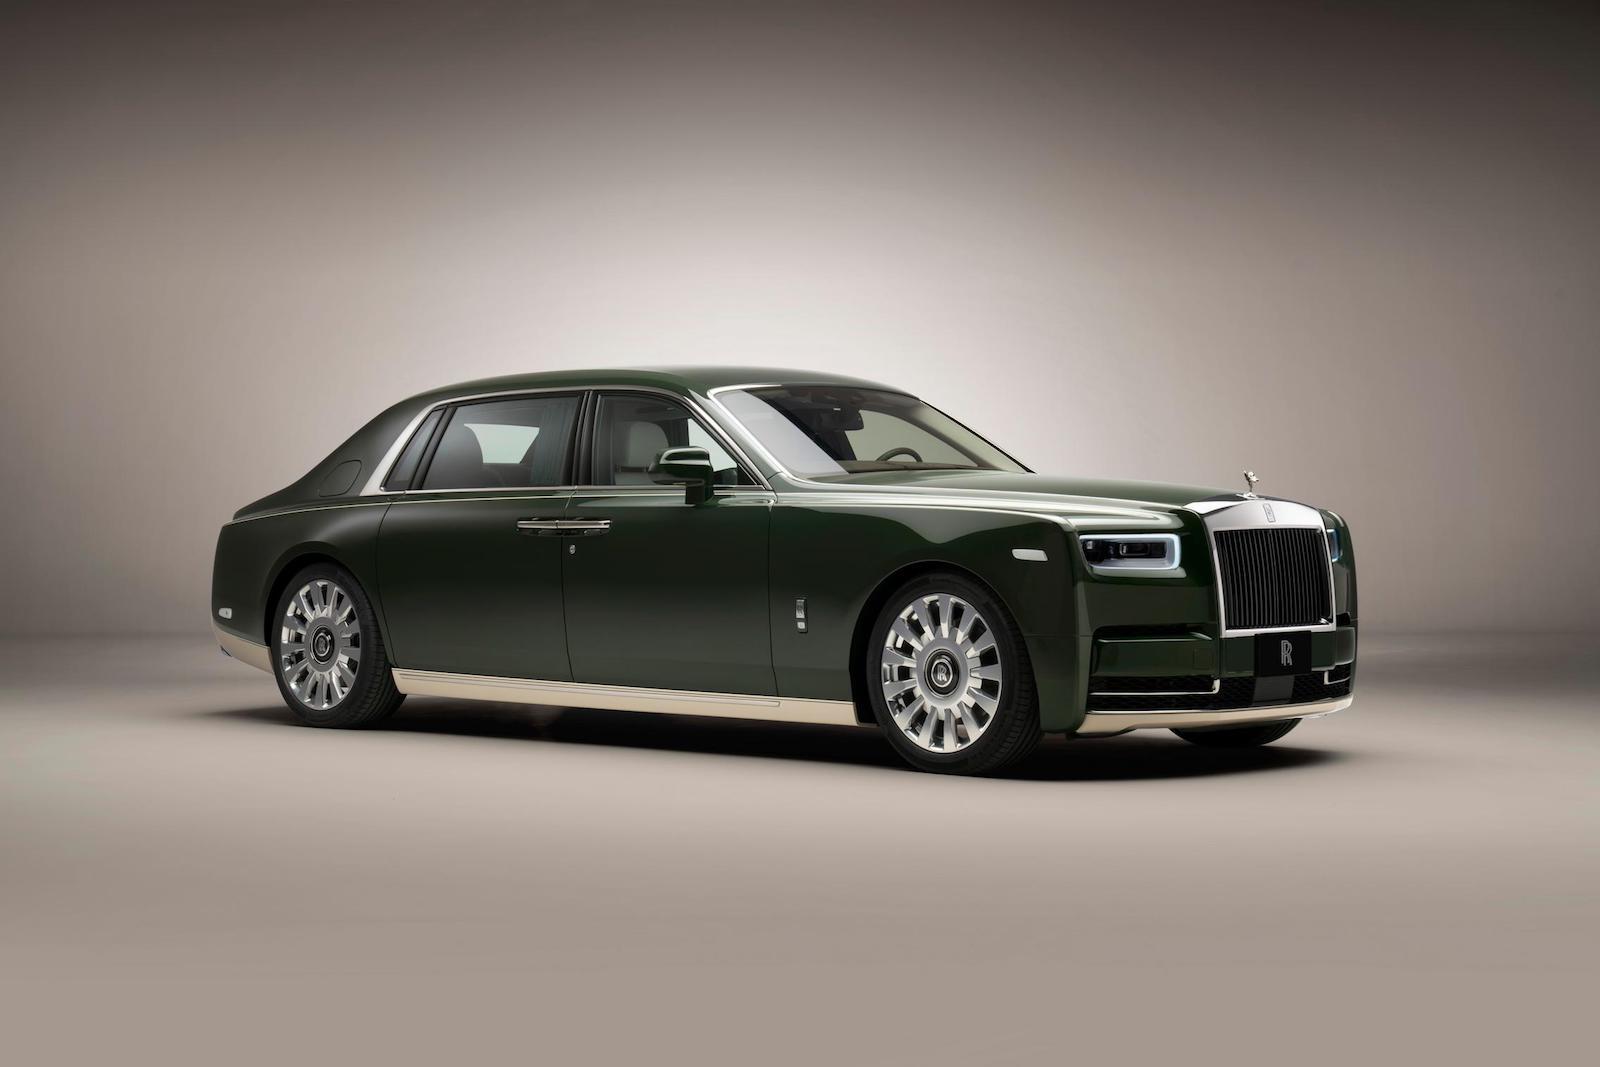 Hermes Rolls Royce-Phantom